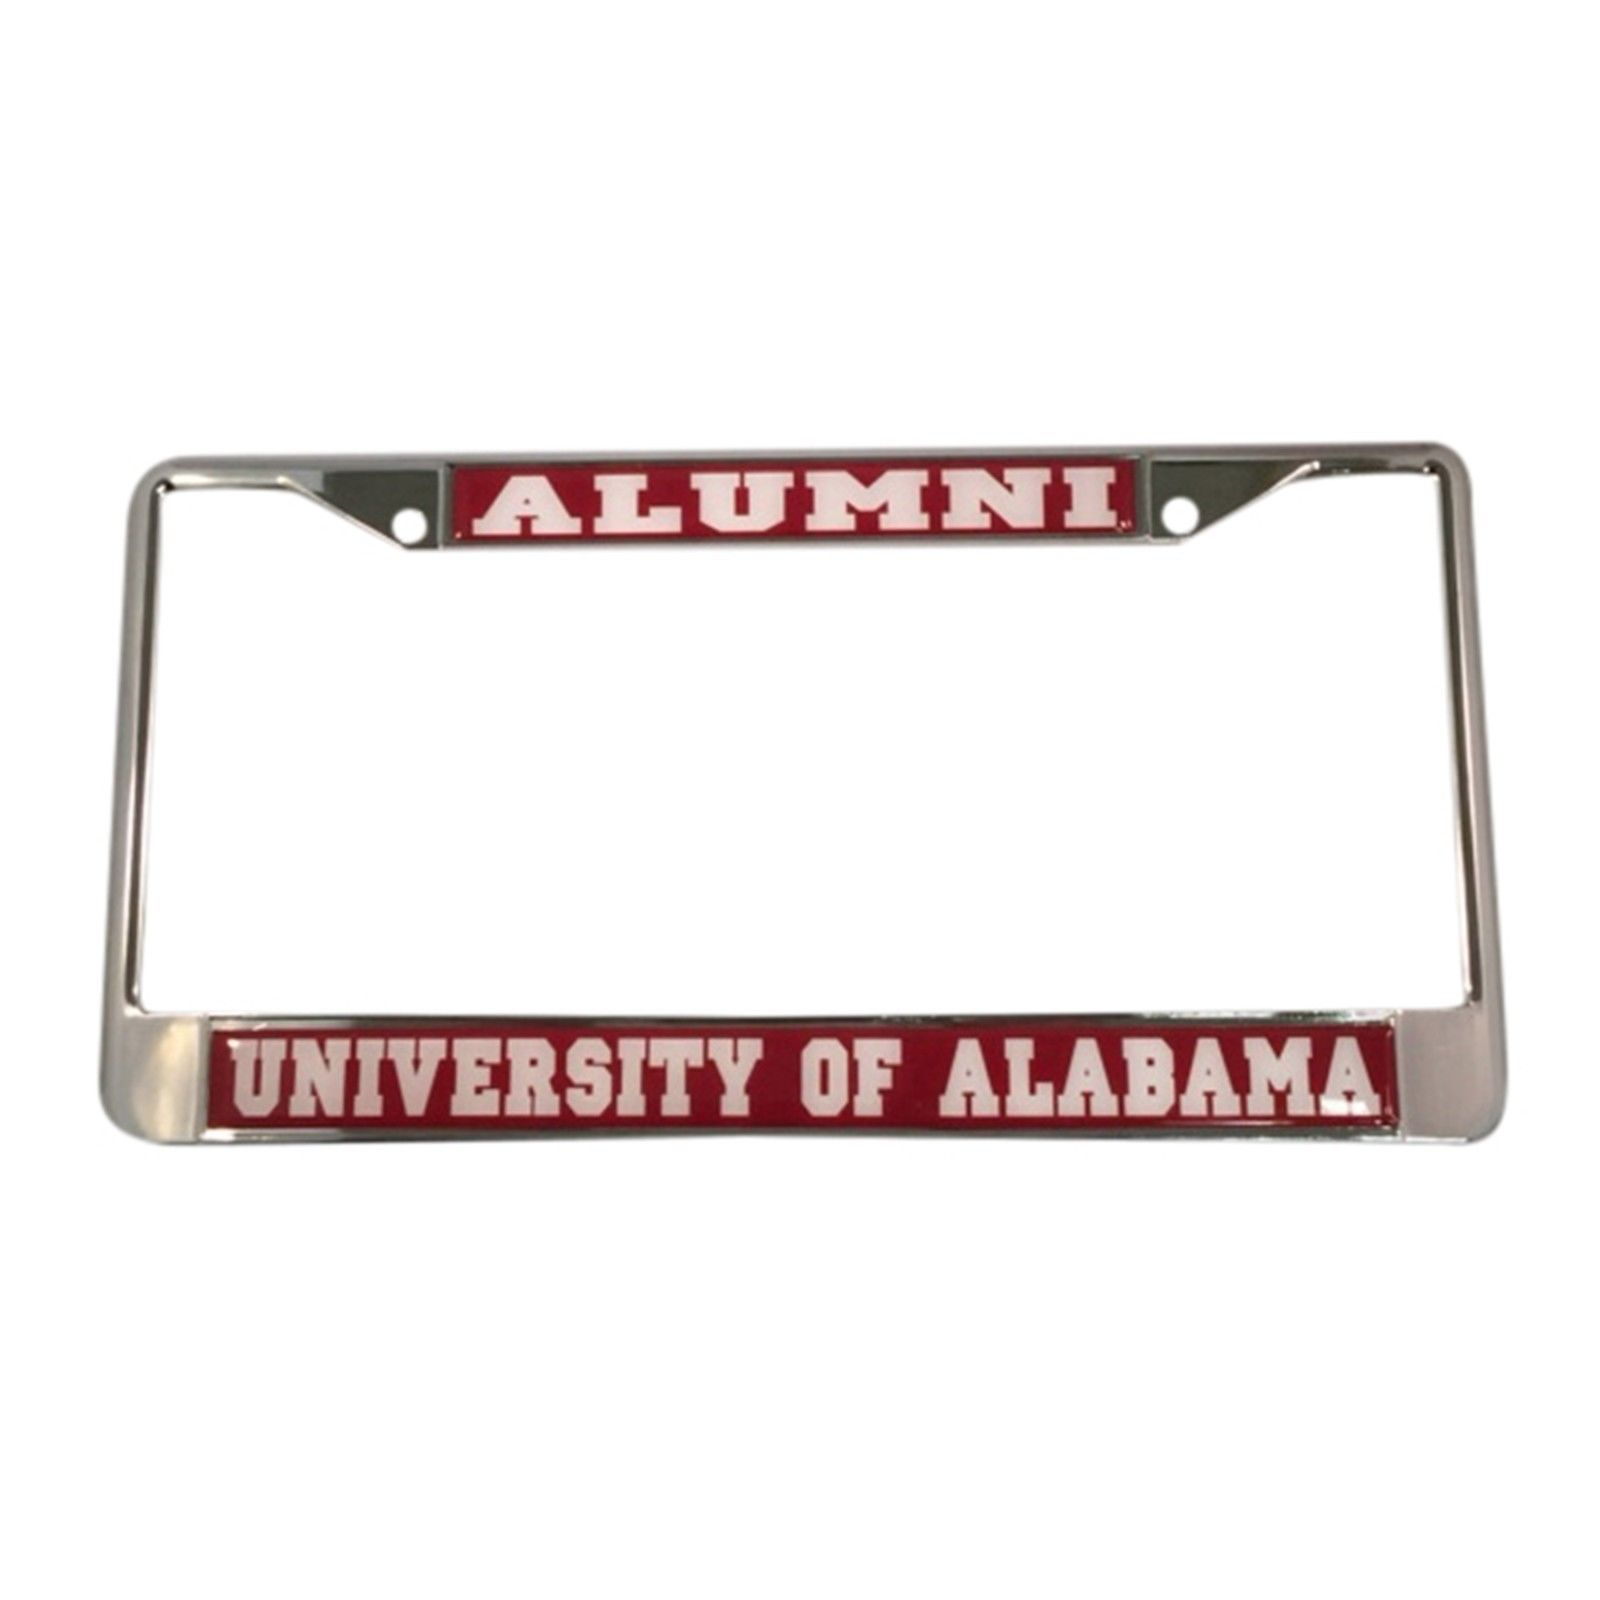 University of Alabama Roll Tide Alumni License Plate Frame - Walmart.com